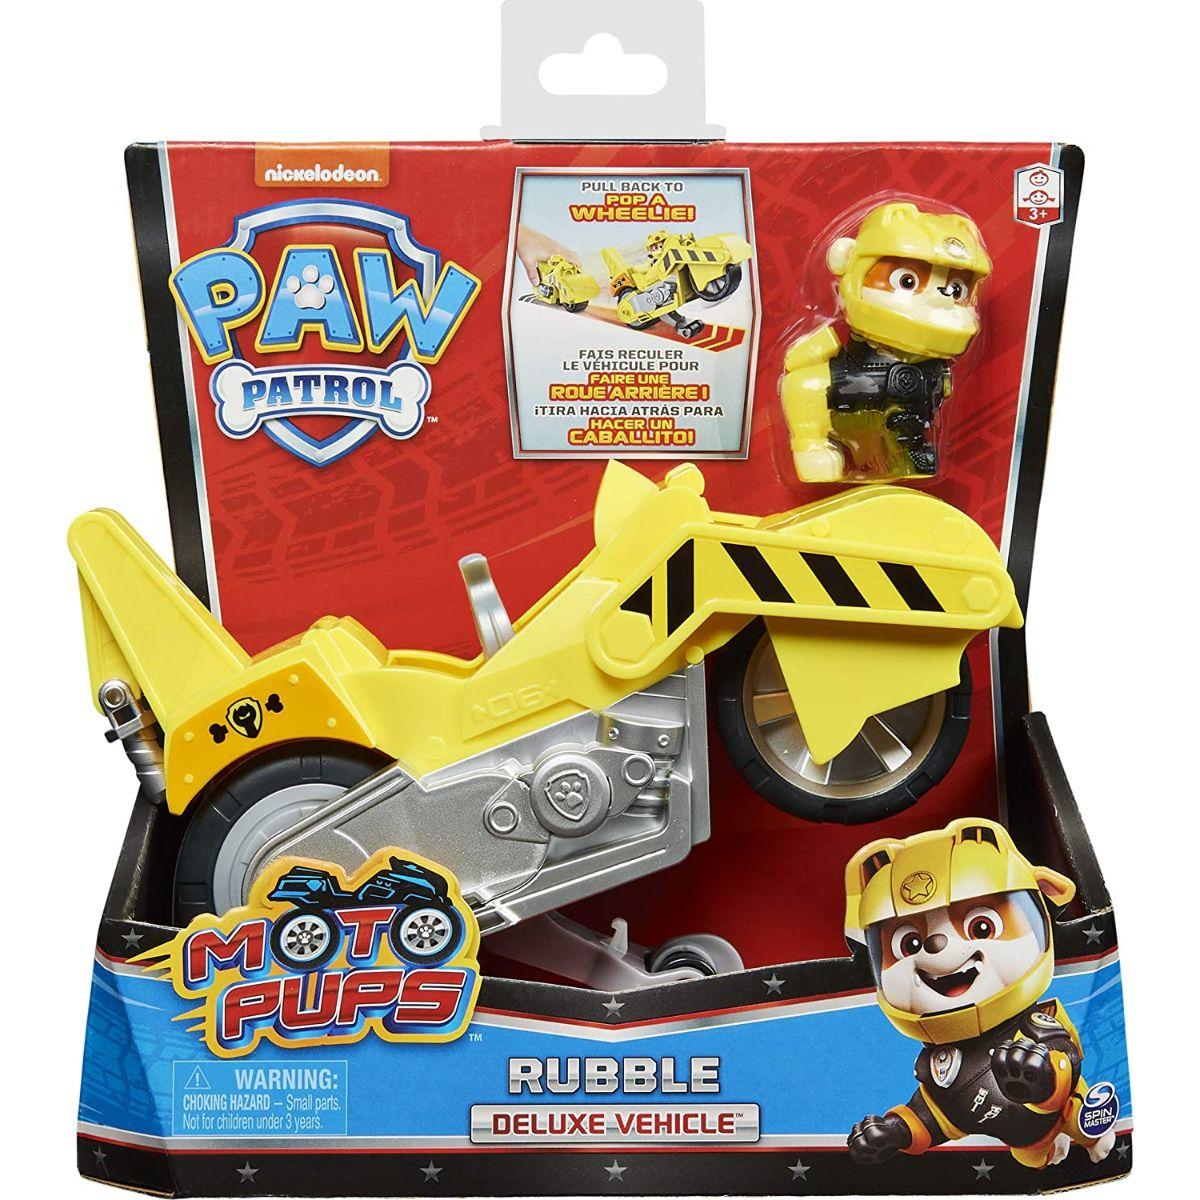 Motocicleta si figurina Paw Patrol Moto Pups, Rubble, 20127785